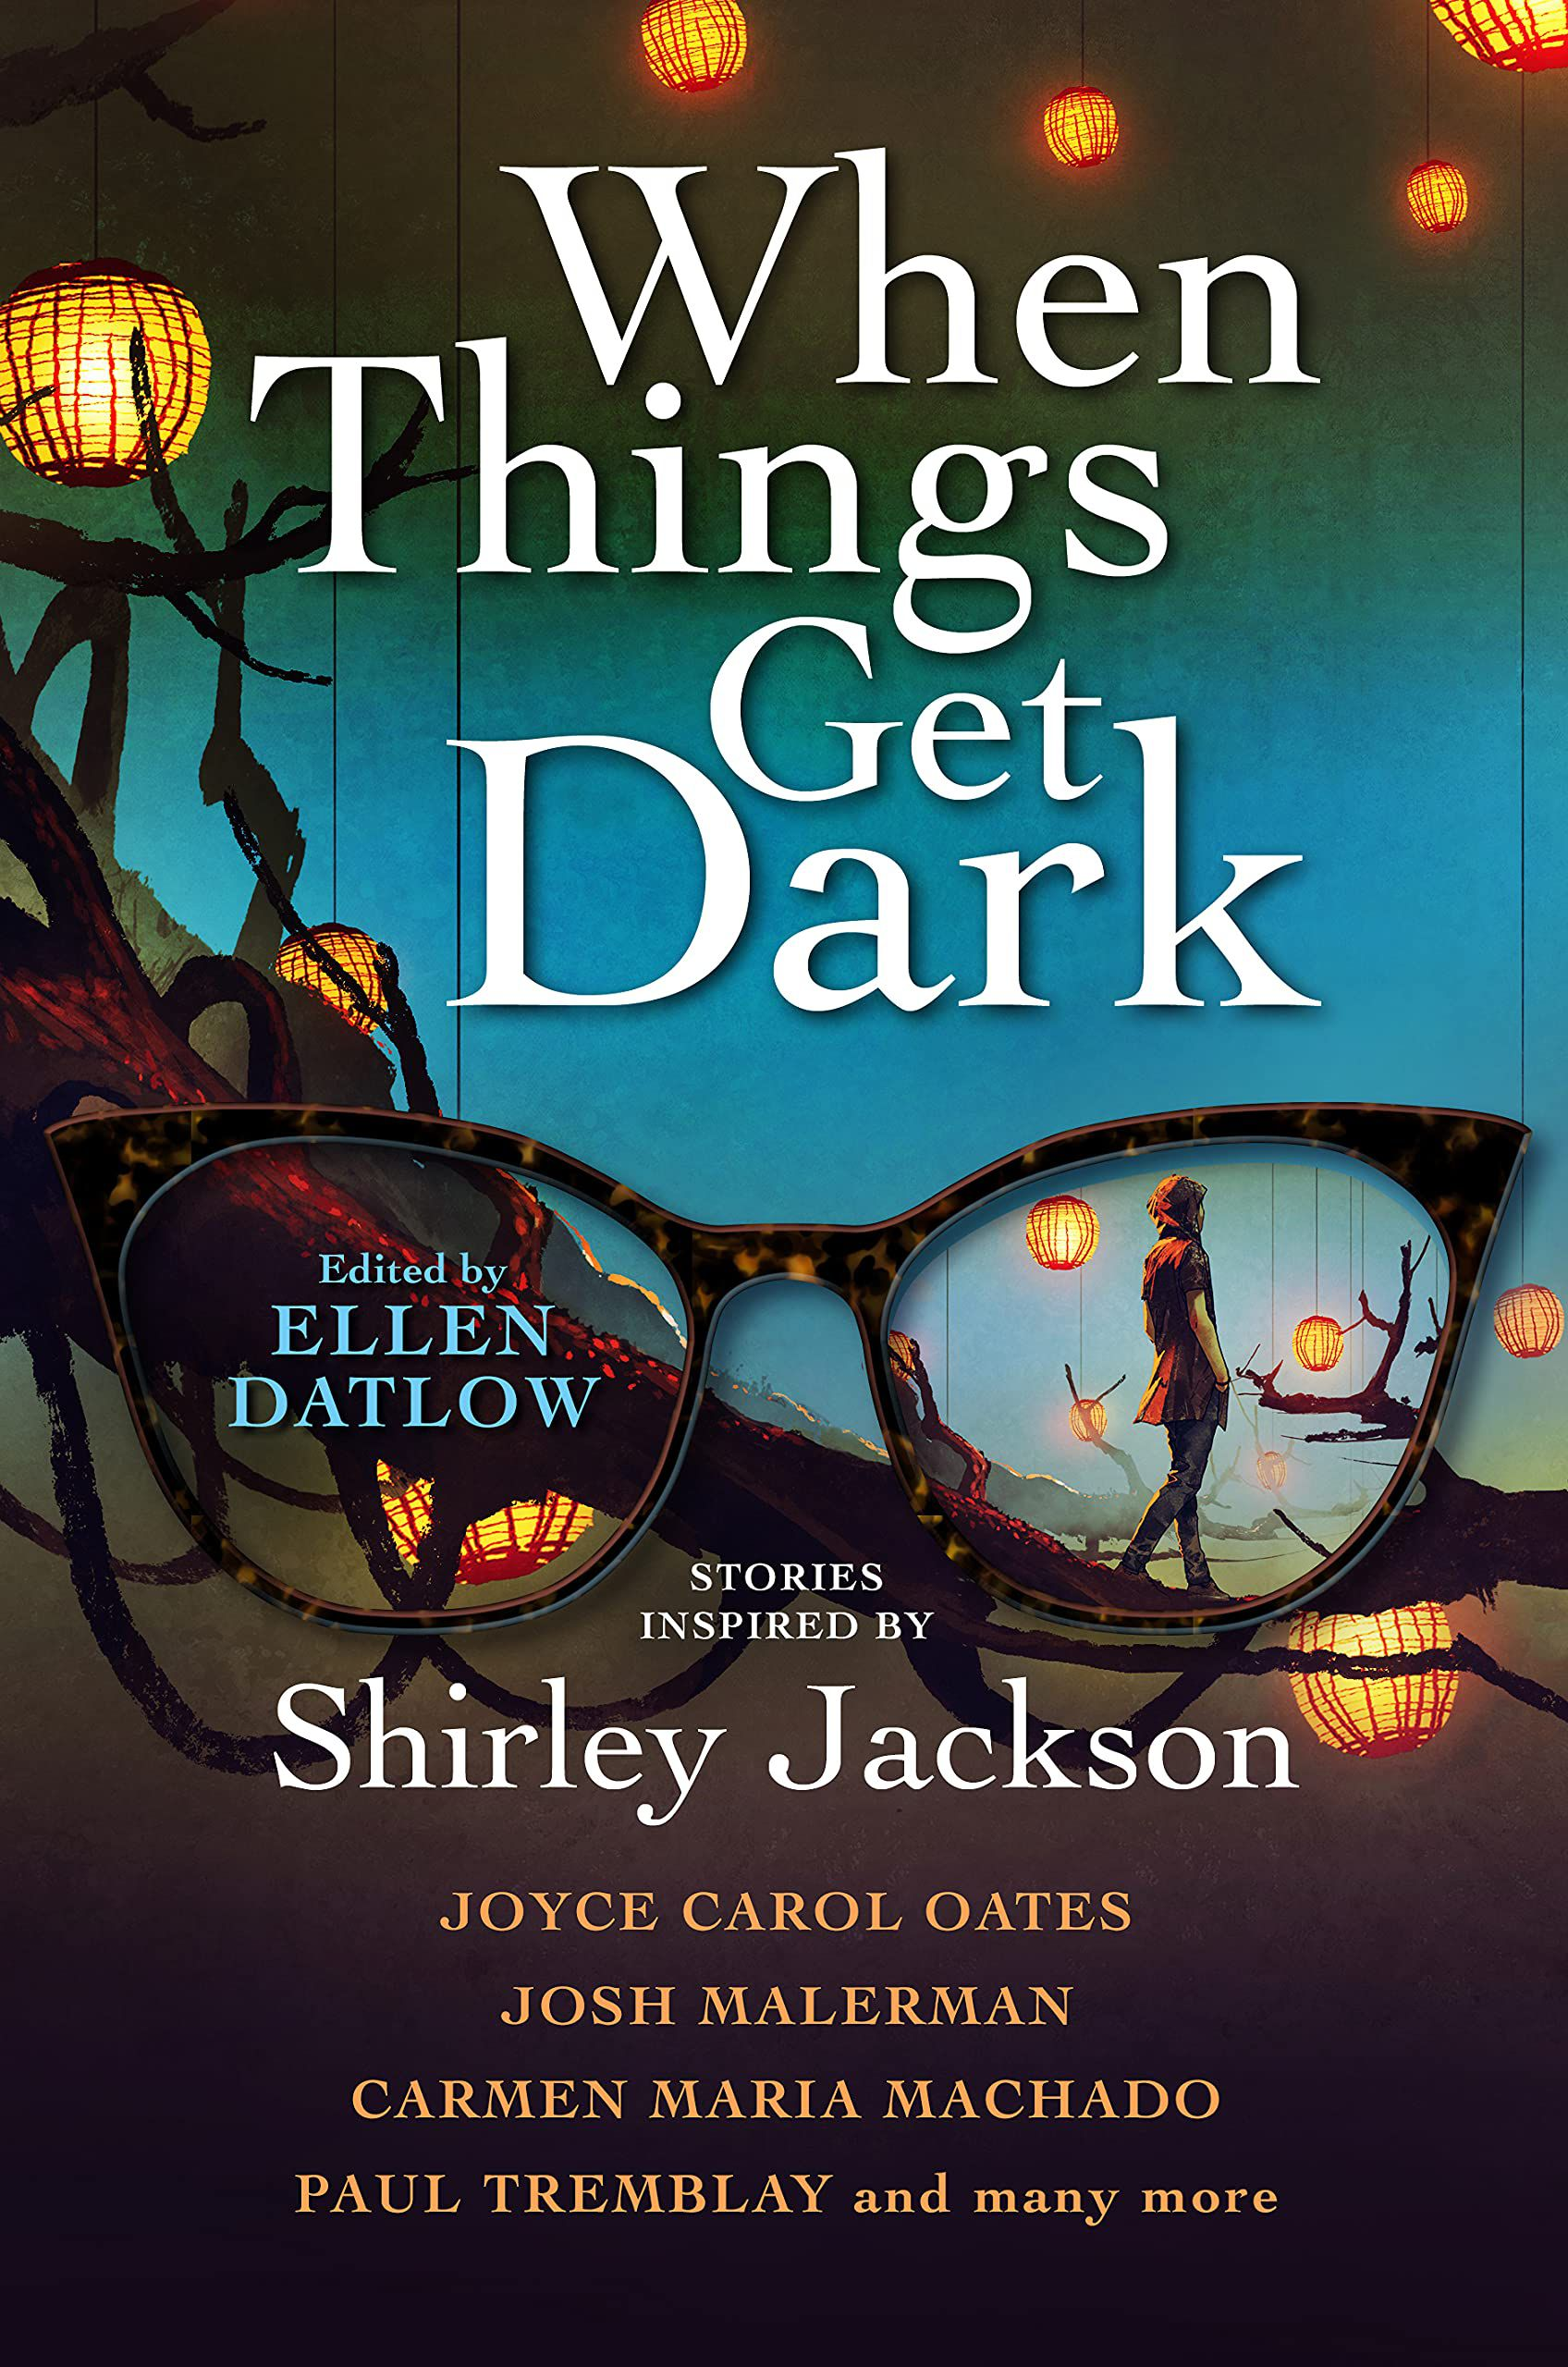 cover image of When Things Get Dark edited by Ellen Datlow